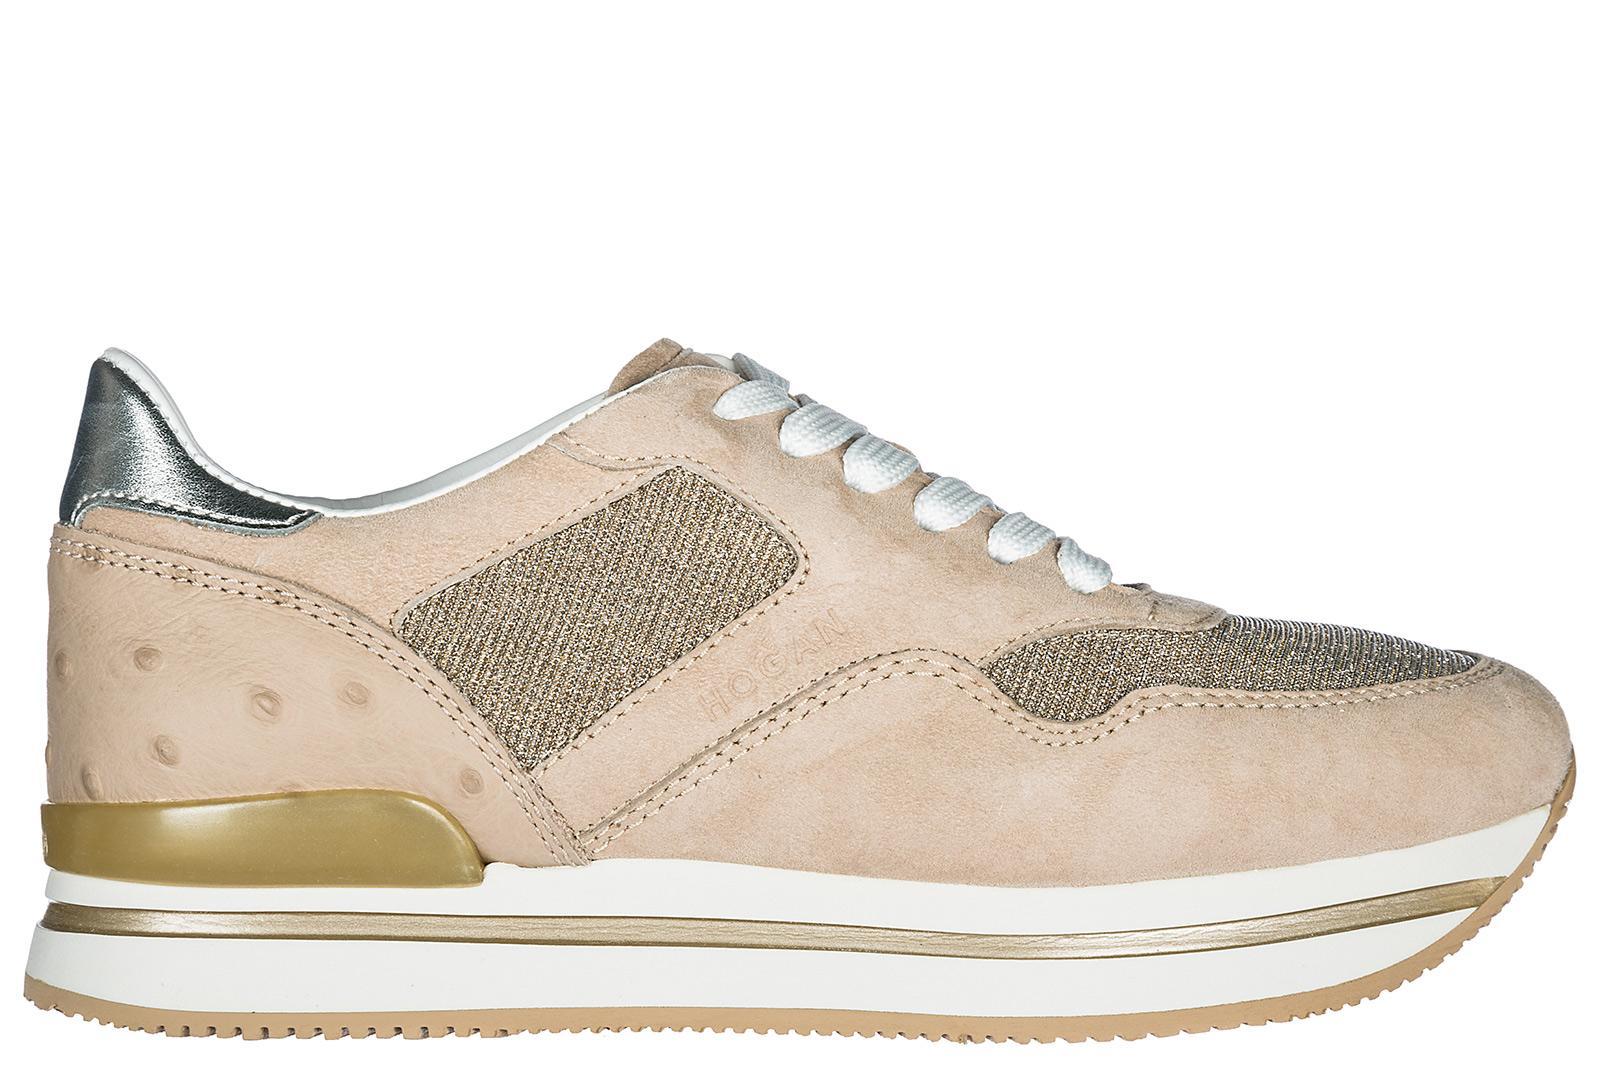 Hogan Damenschuhe Turnschuhe Damen Wildleder Schuhe Sneakers H222 In Beige